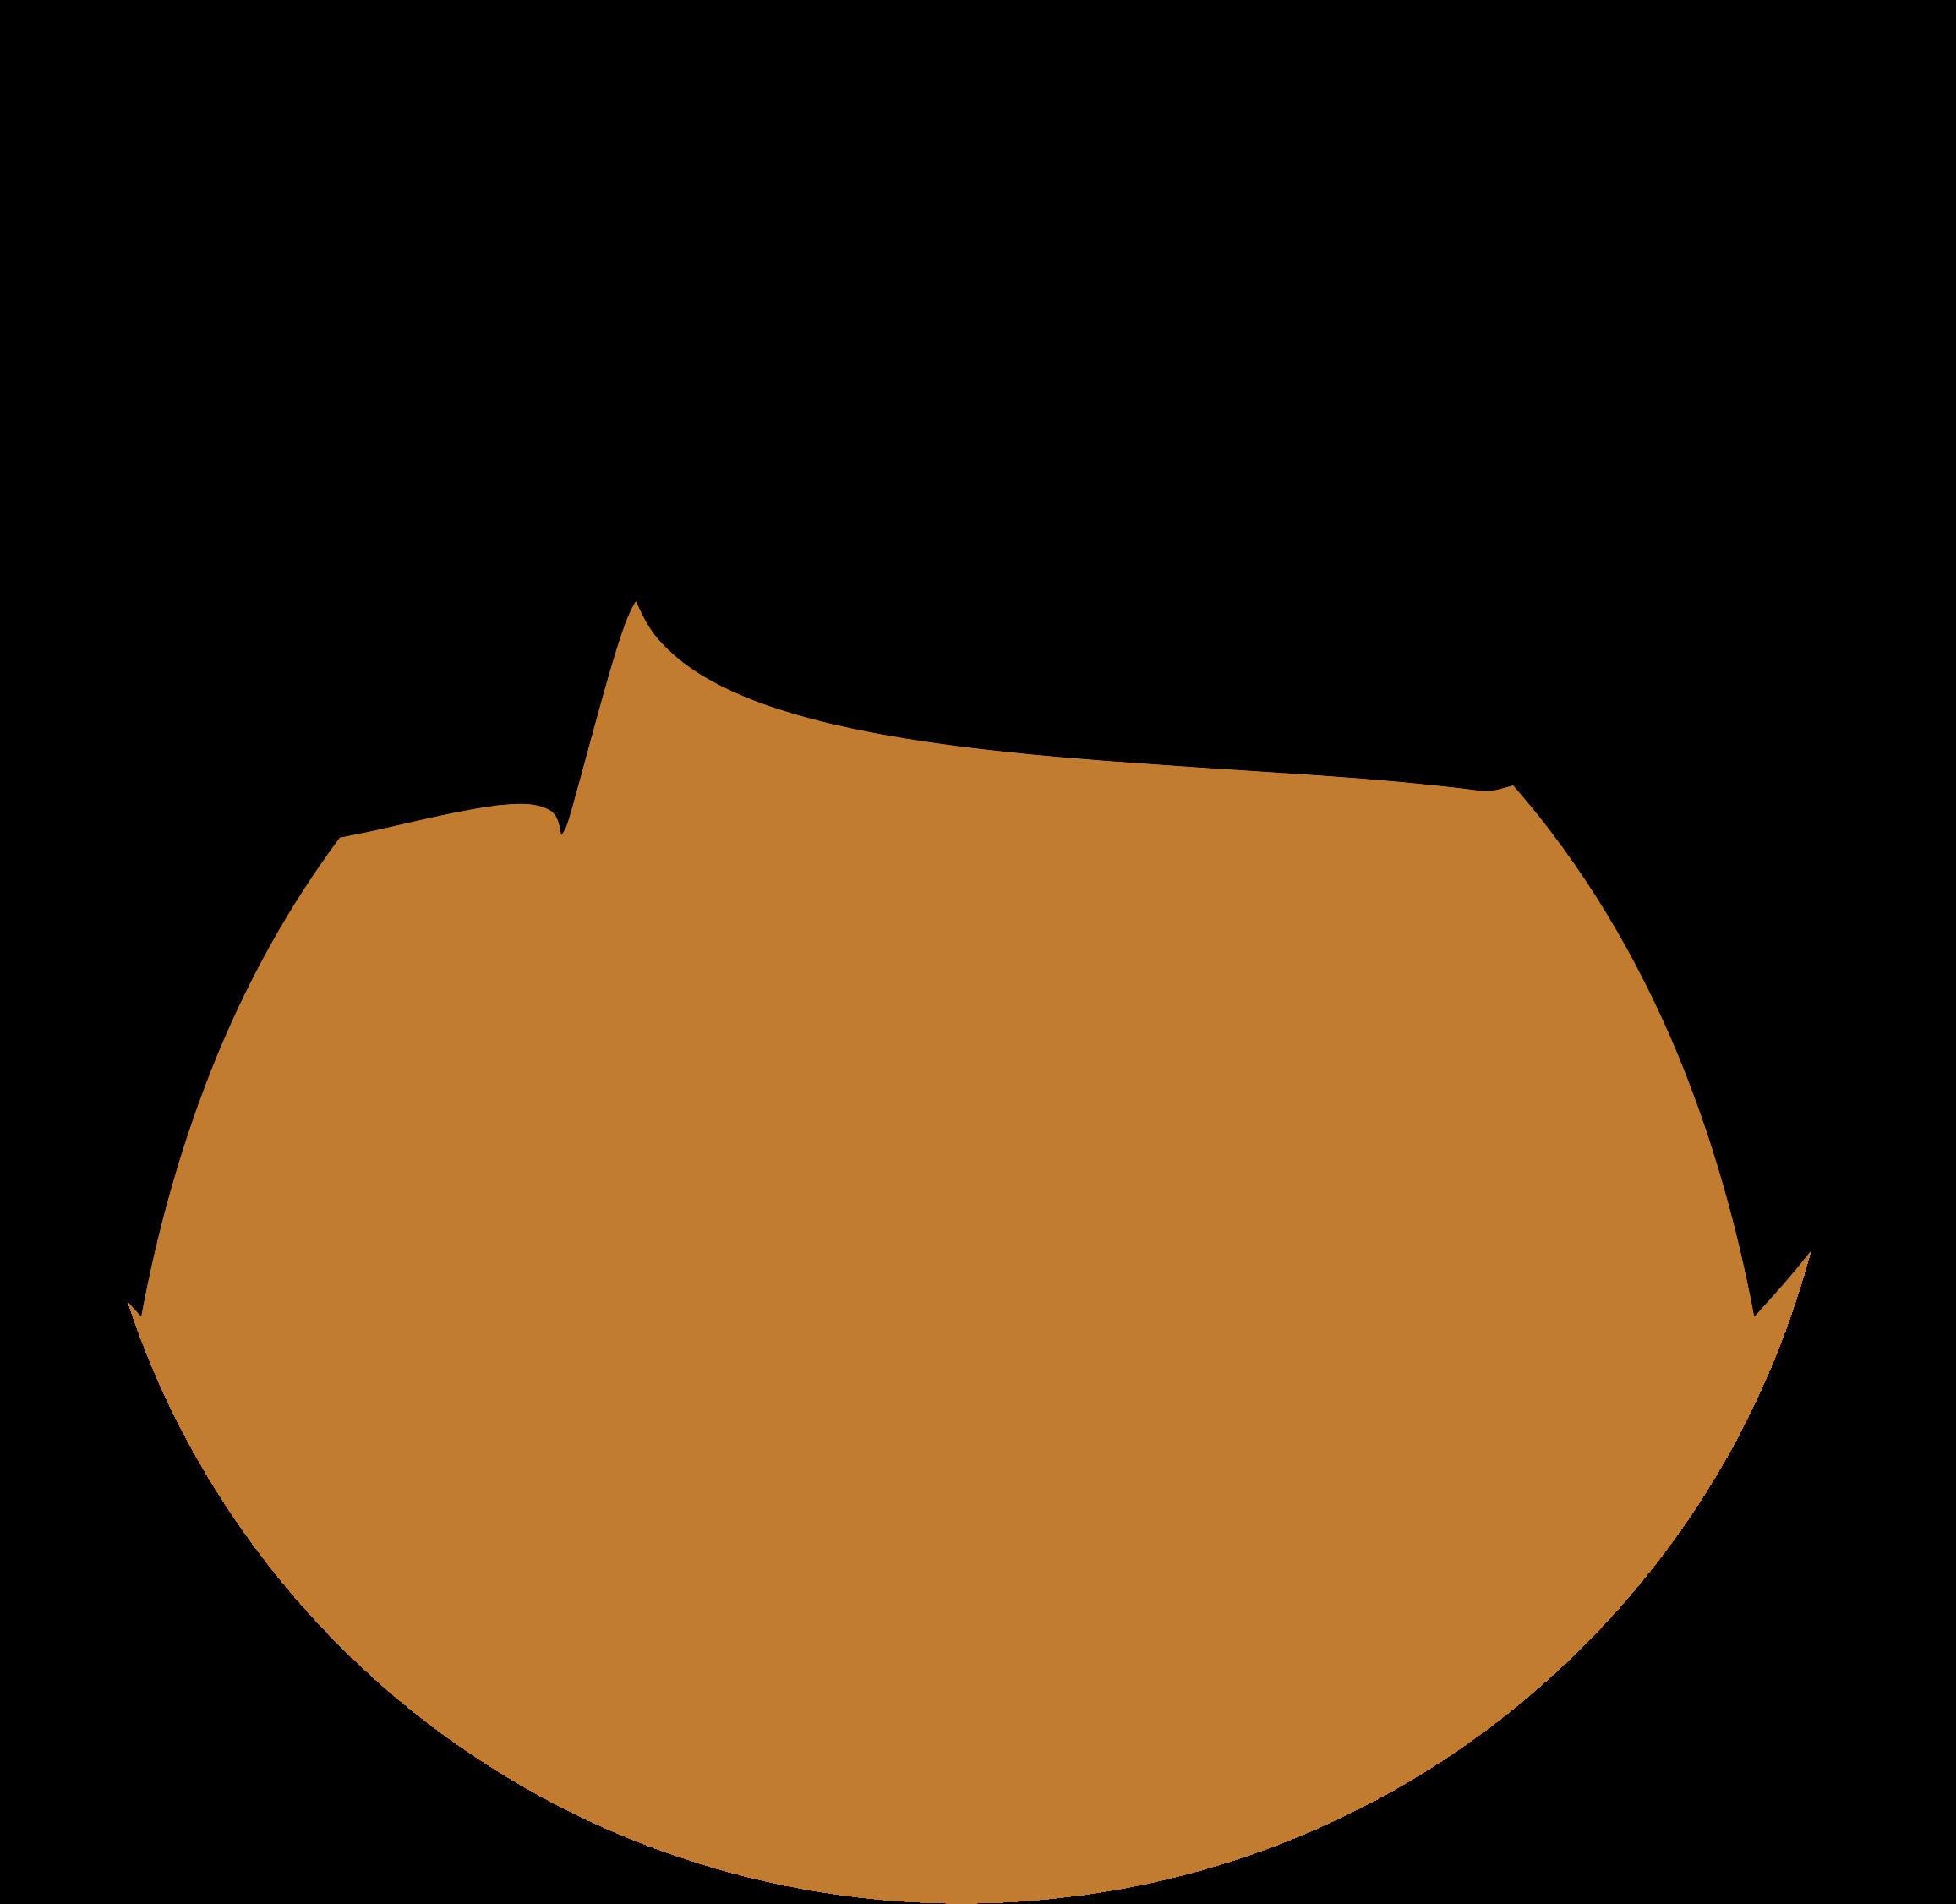 Transparent head clipart - Head Clipart